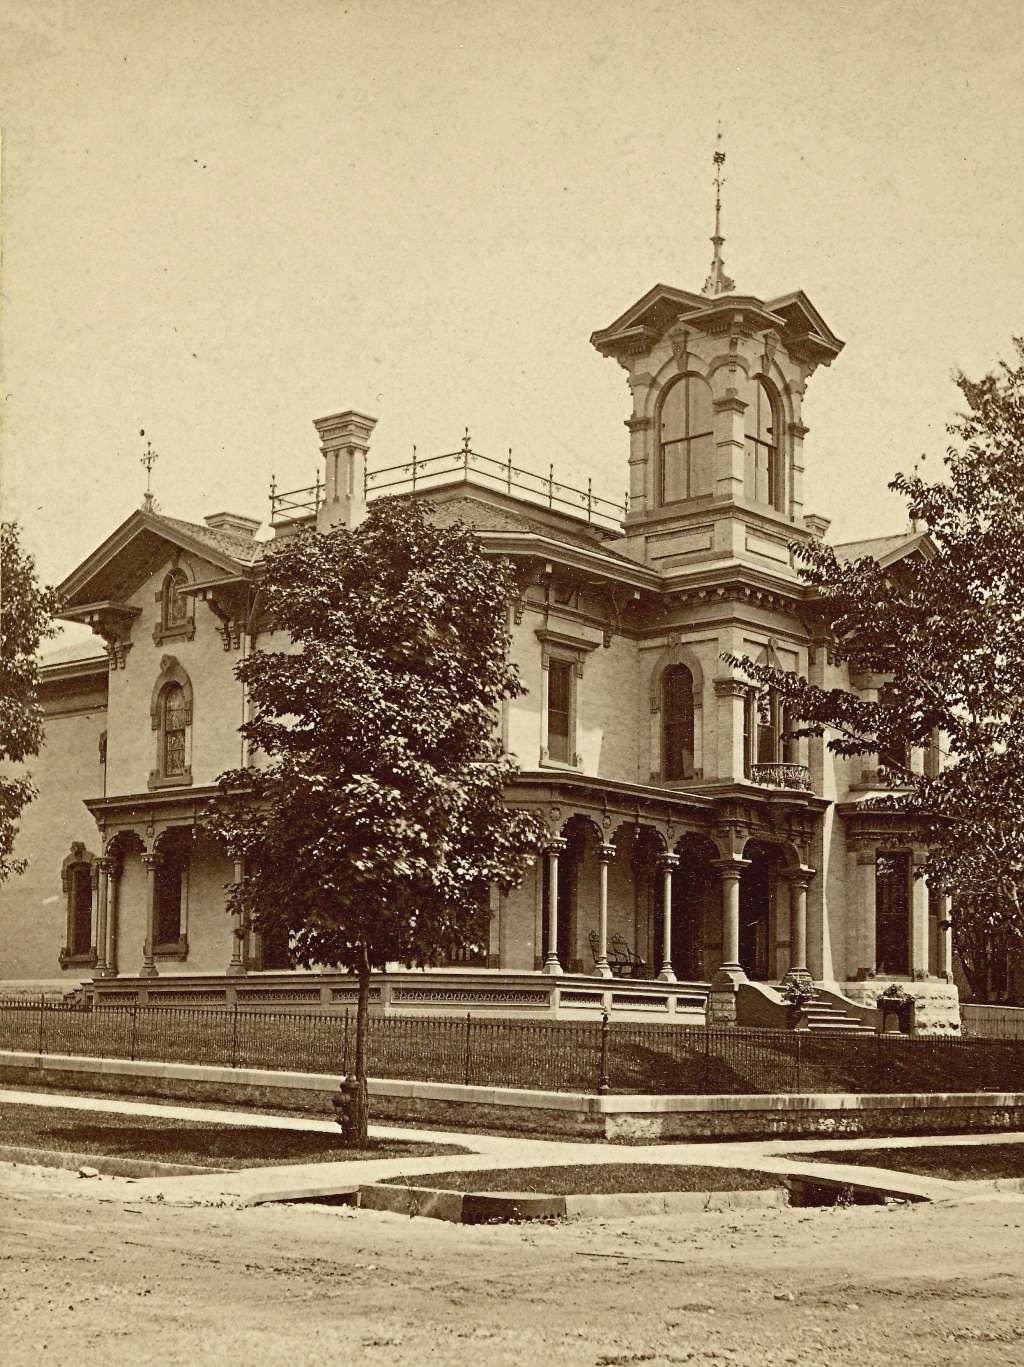 Elias Friend Residence, 1879. Image courtesy of Jeff Beutner.